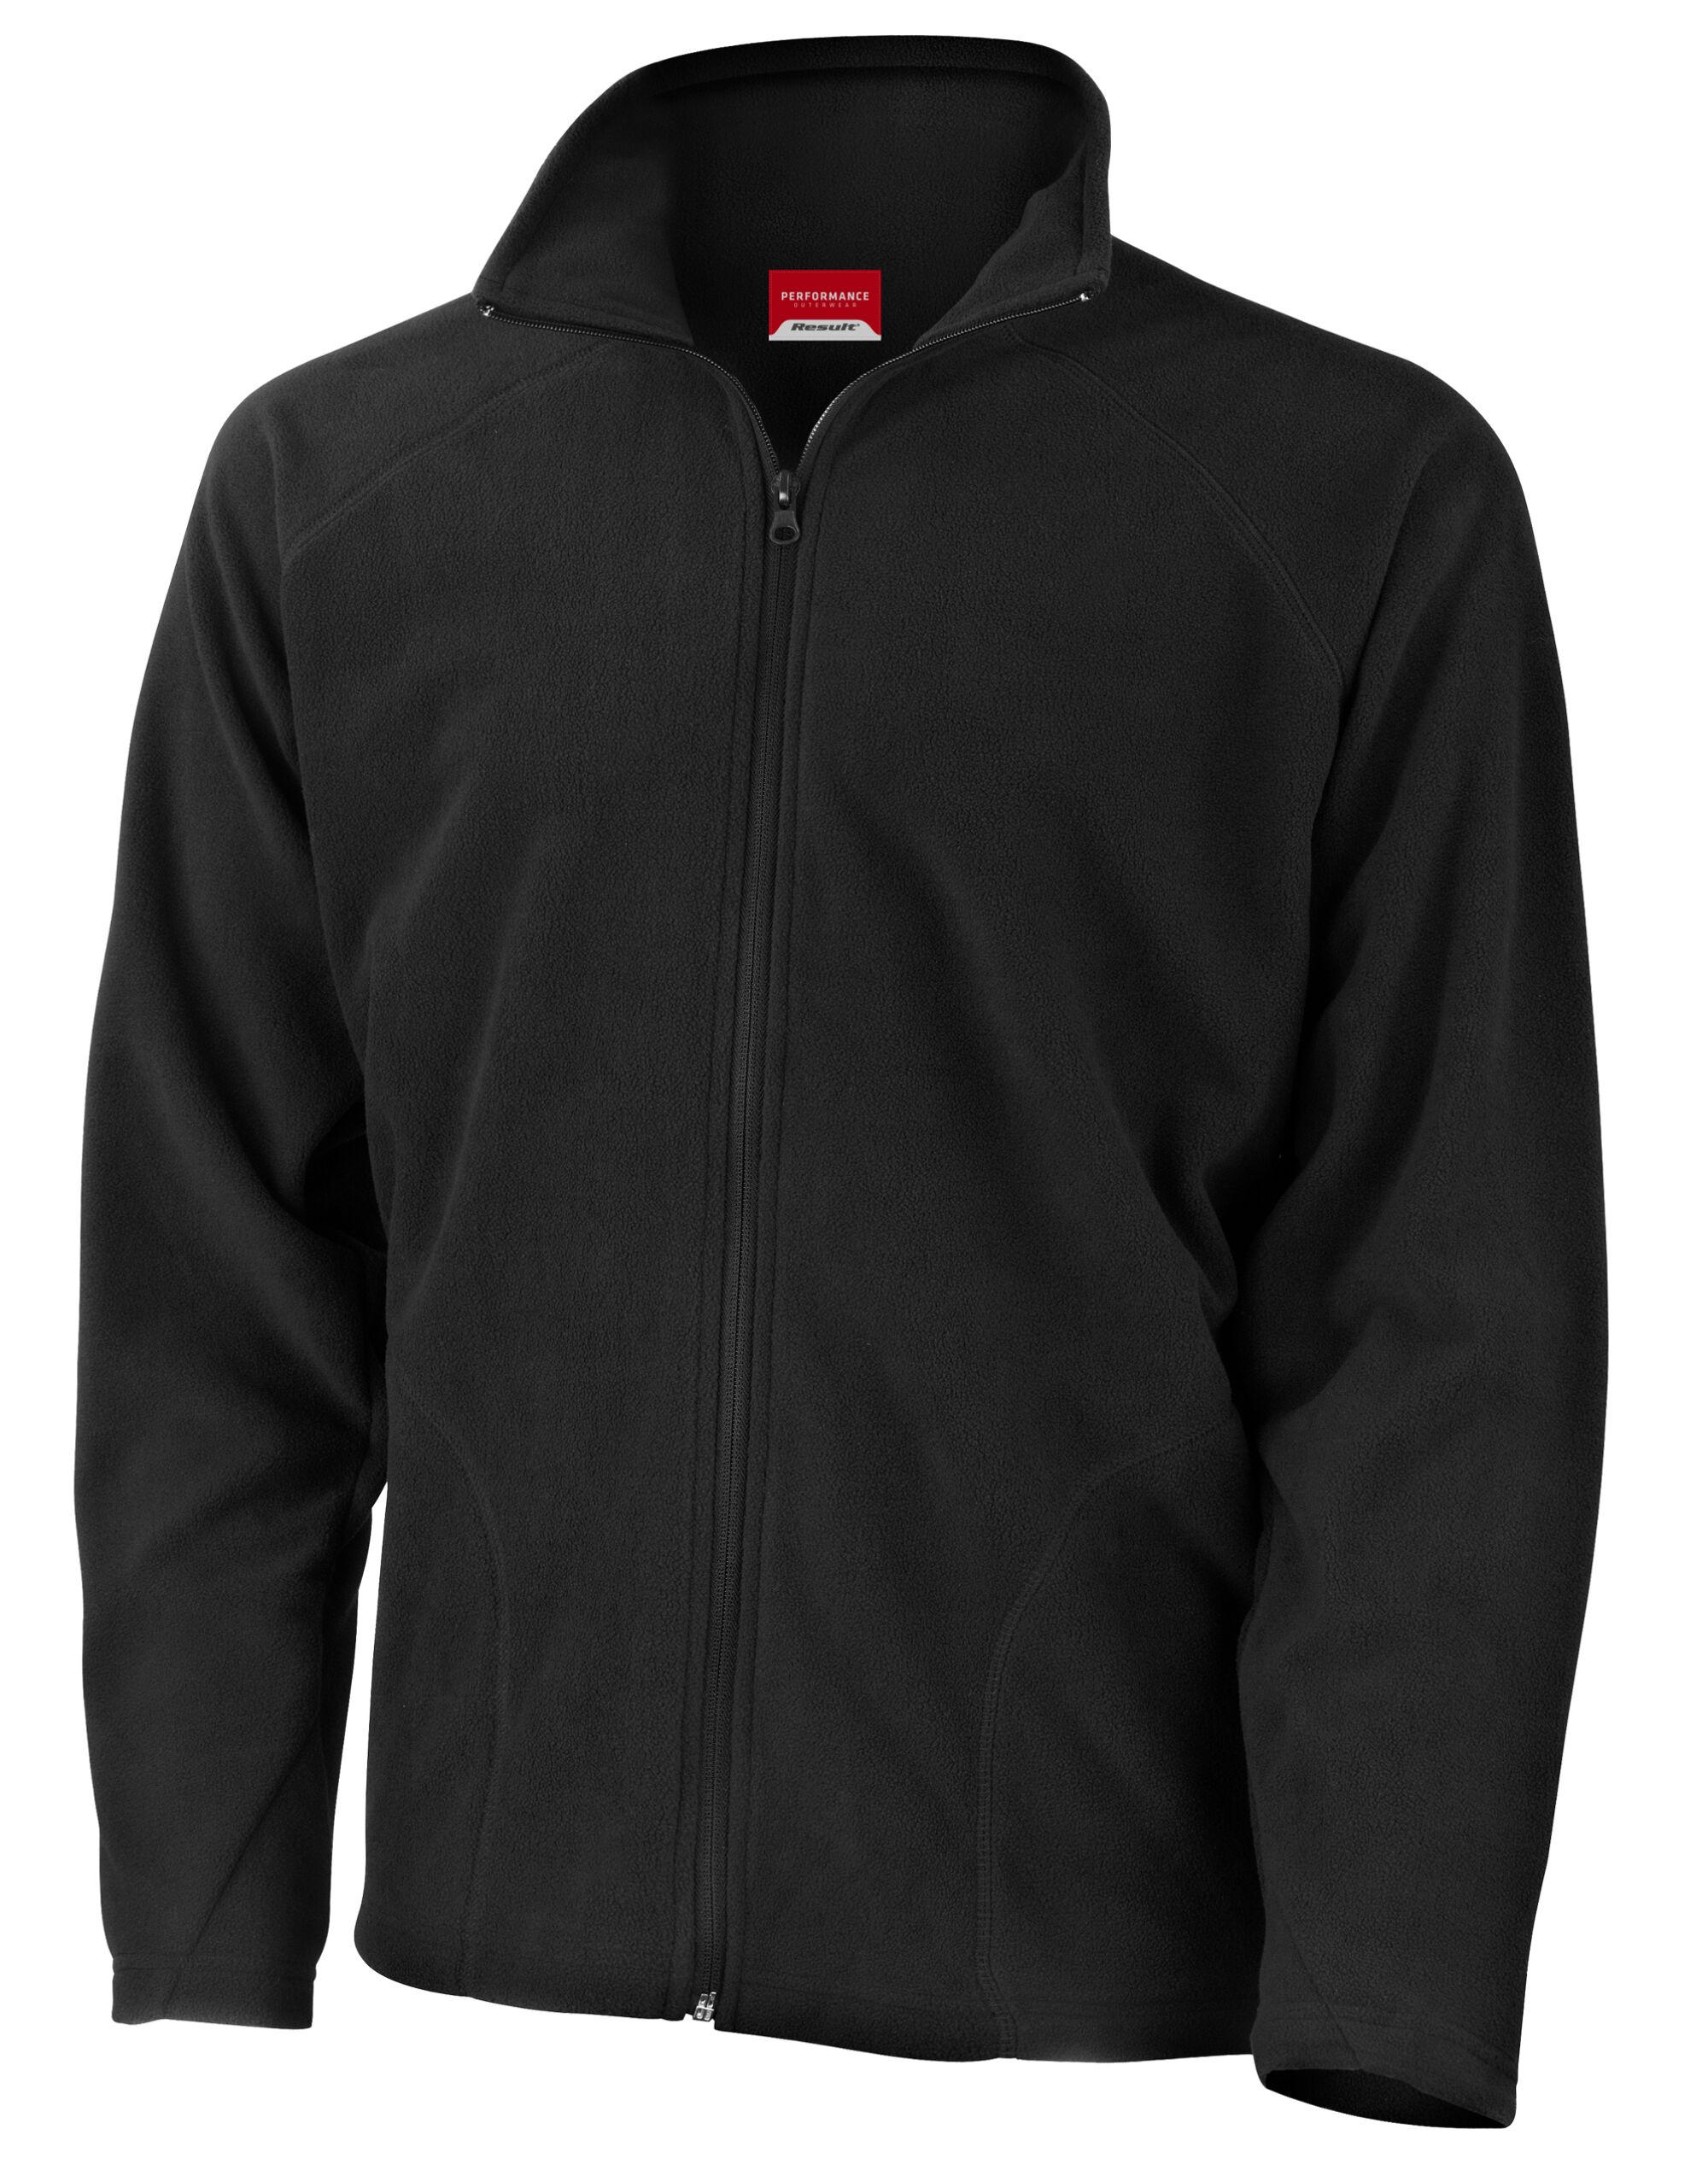 Core Men's Micron Fleece Jacket